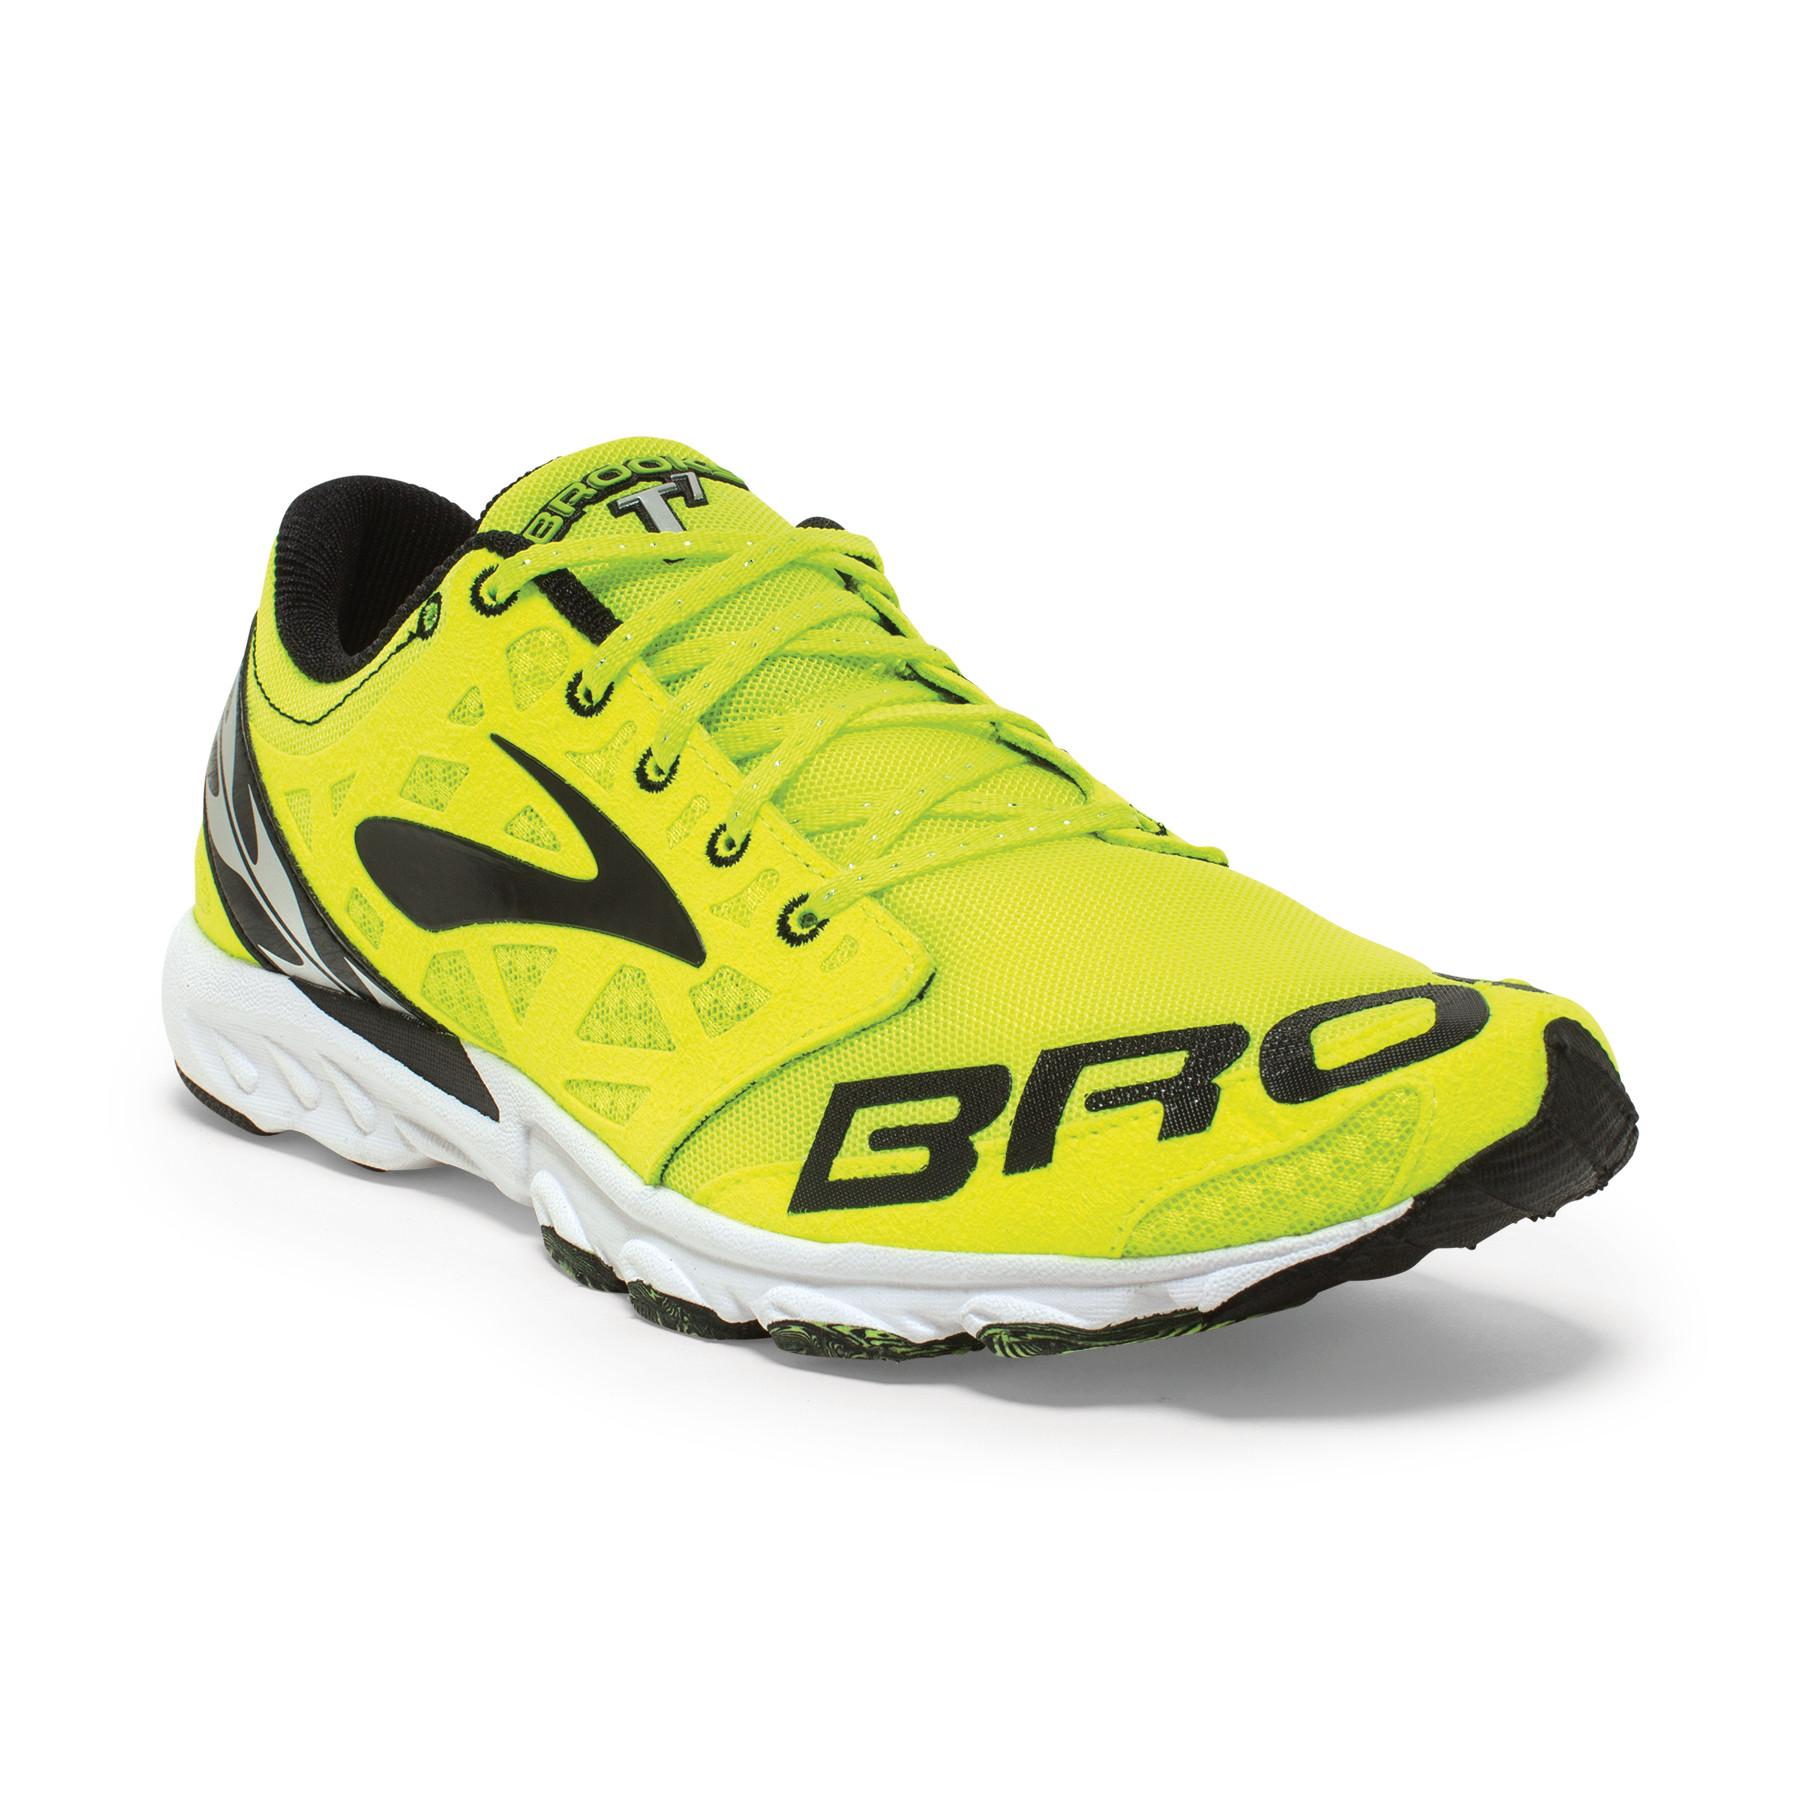 Sale On Brooks Tennis Shoes